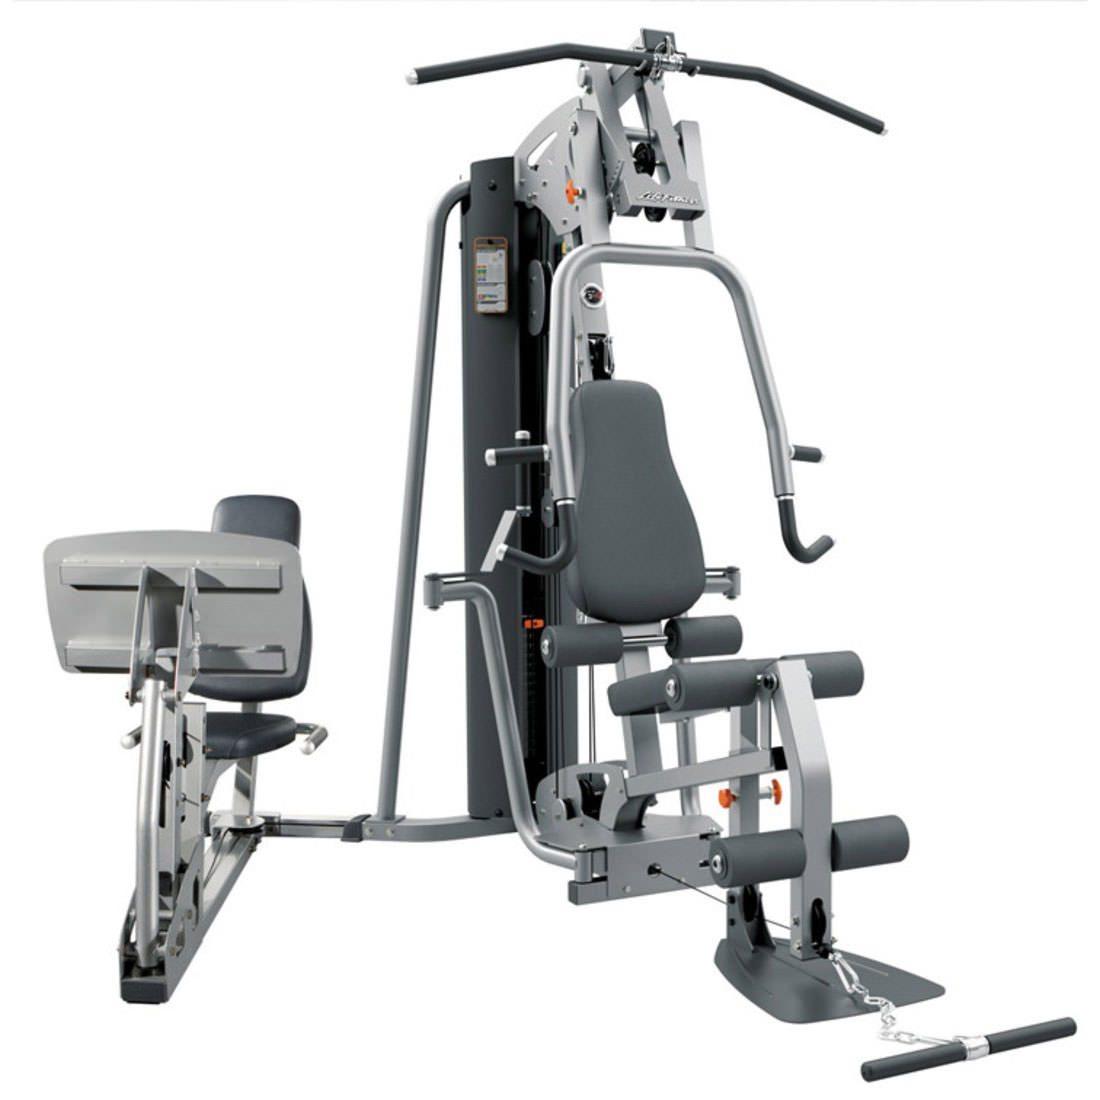 Life Fitness G4 Multi Gym with Leg Press